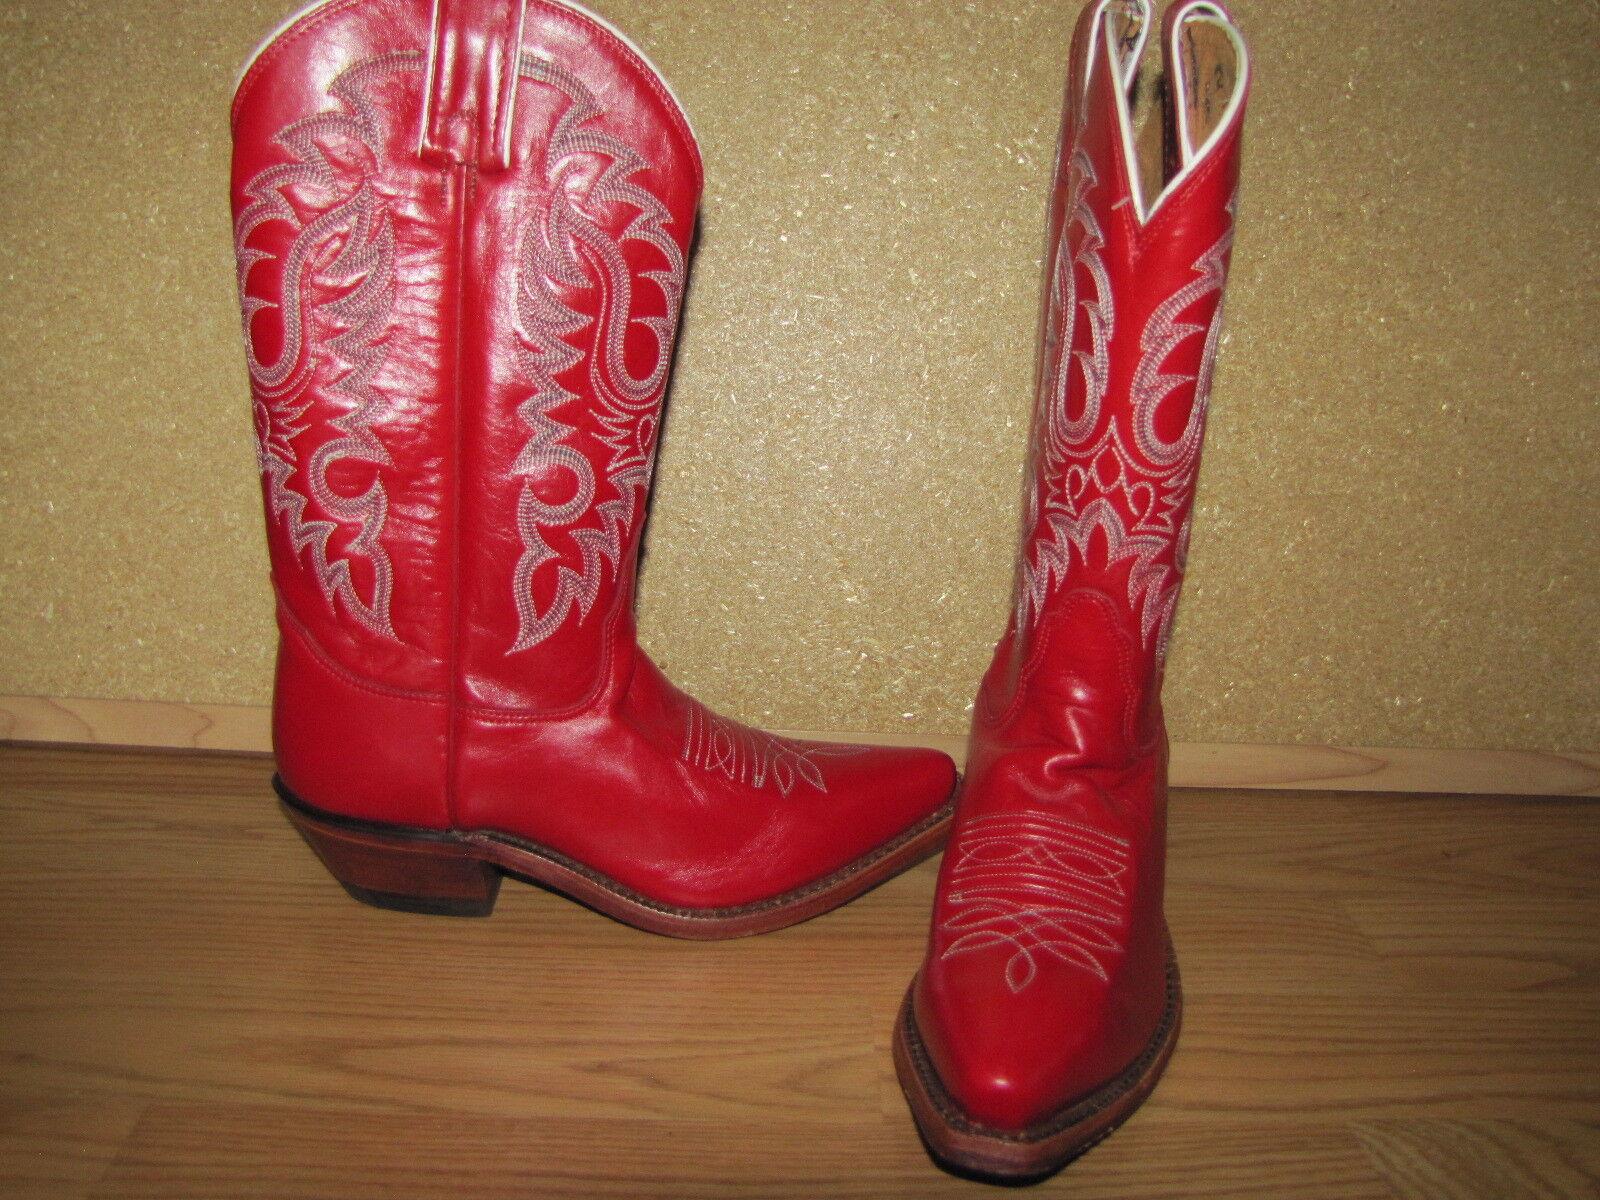 NWOB Boots Nocona Boots Rosso Soft Ice Cowboy Boots NWOB - 6B European 36 533cf9